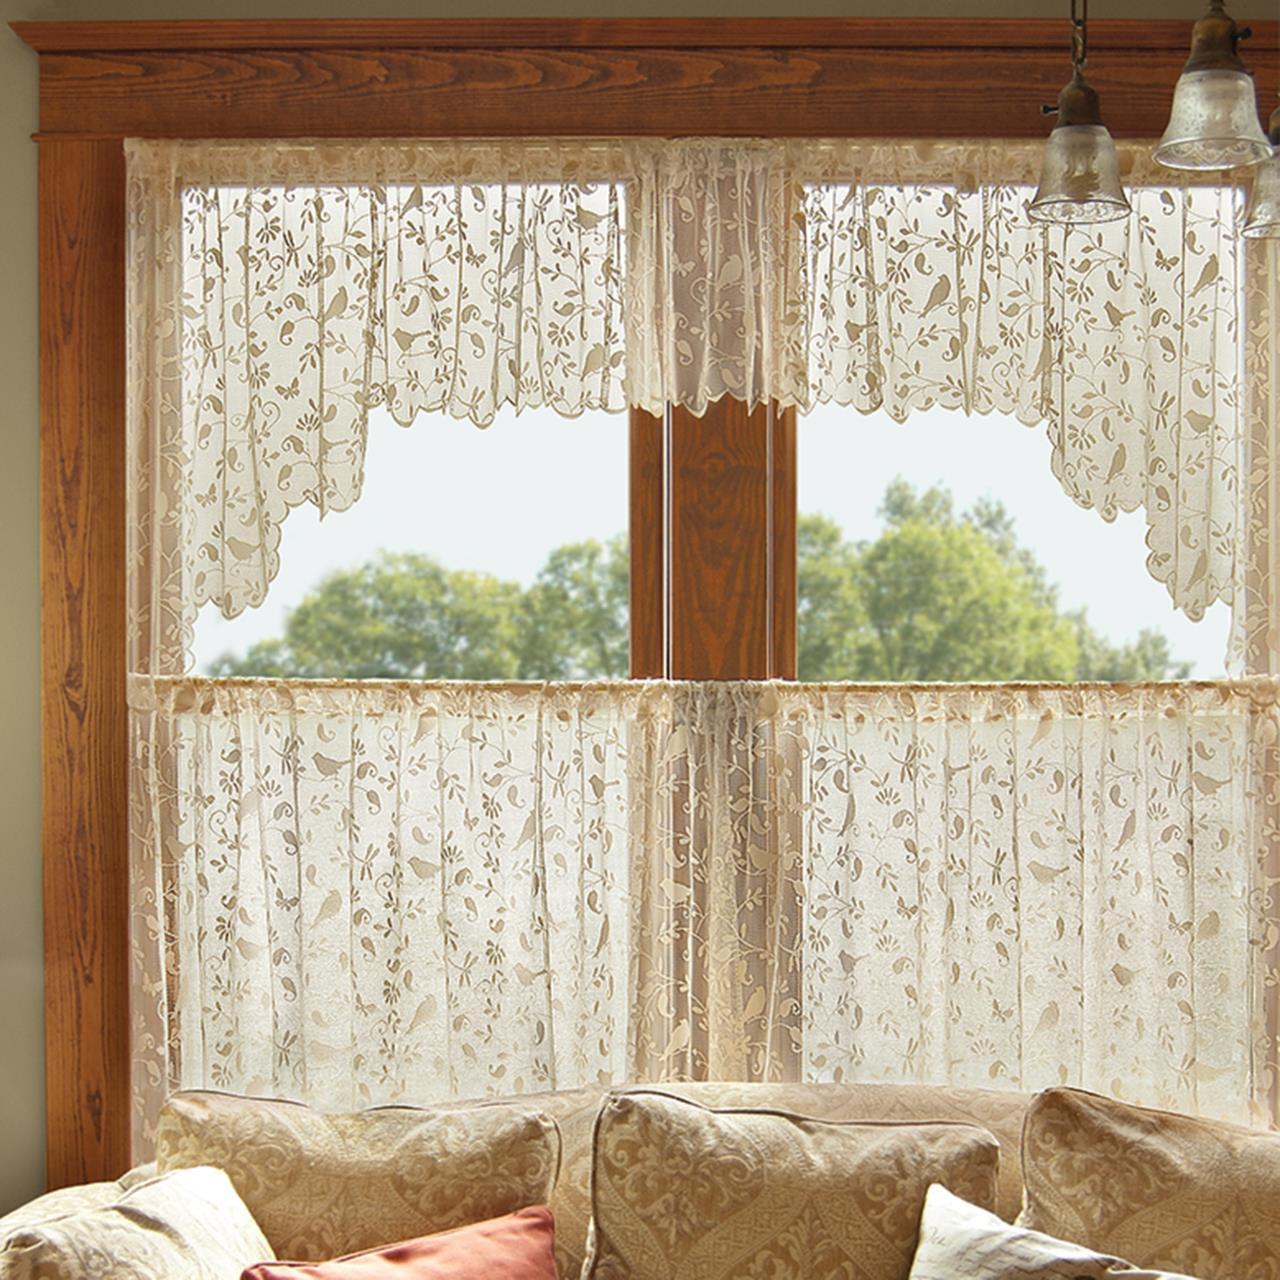 Bristol Garden Lace Curtain Collection -